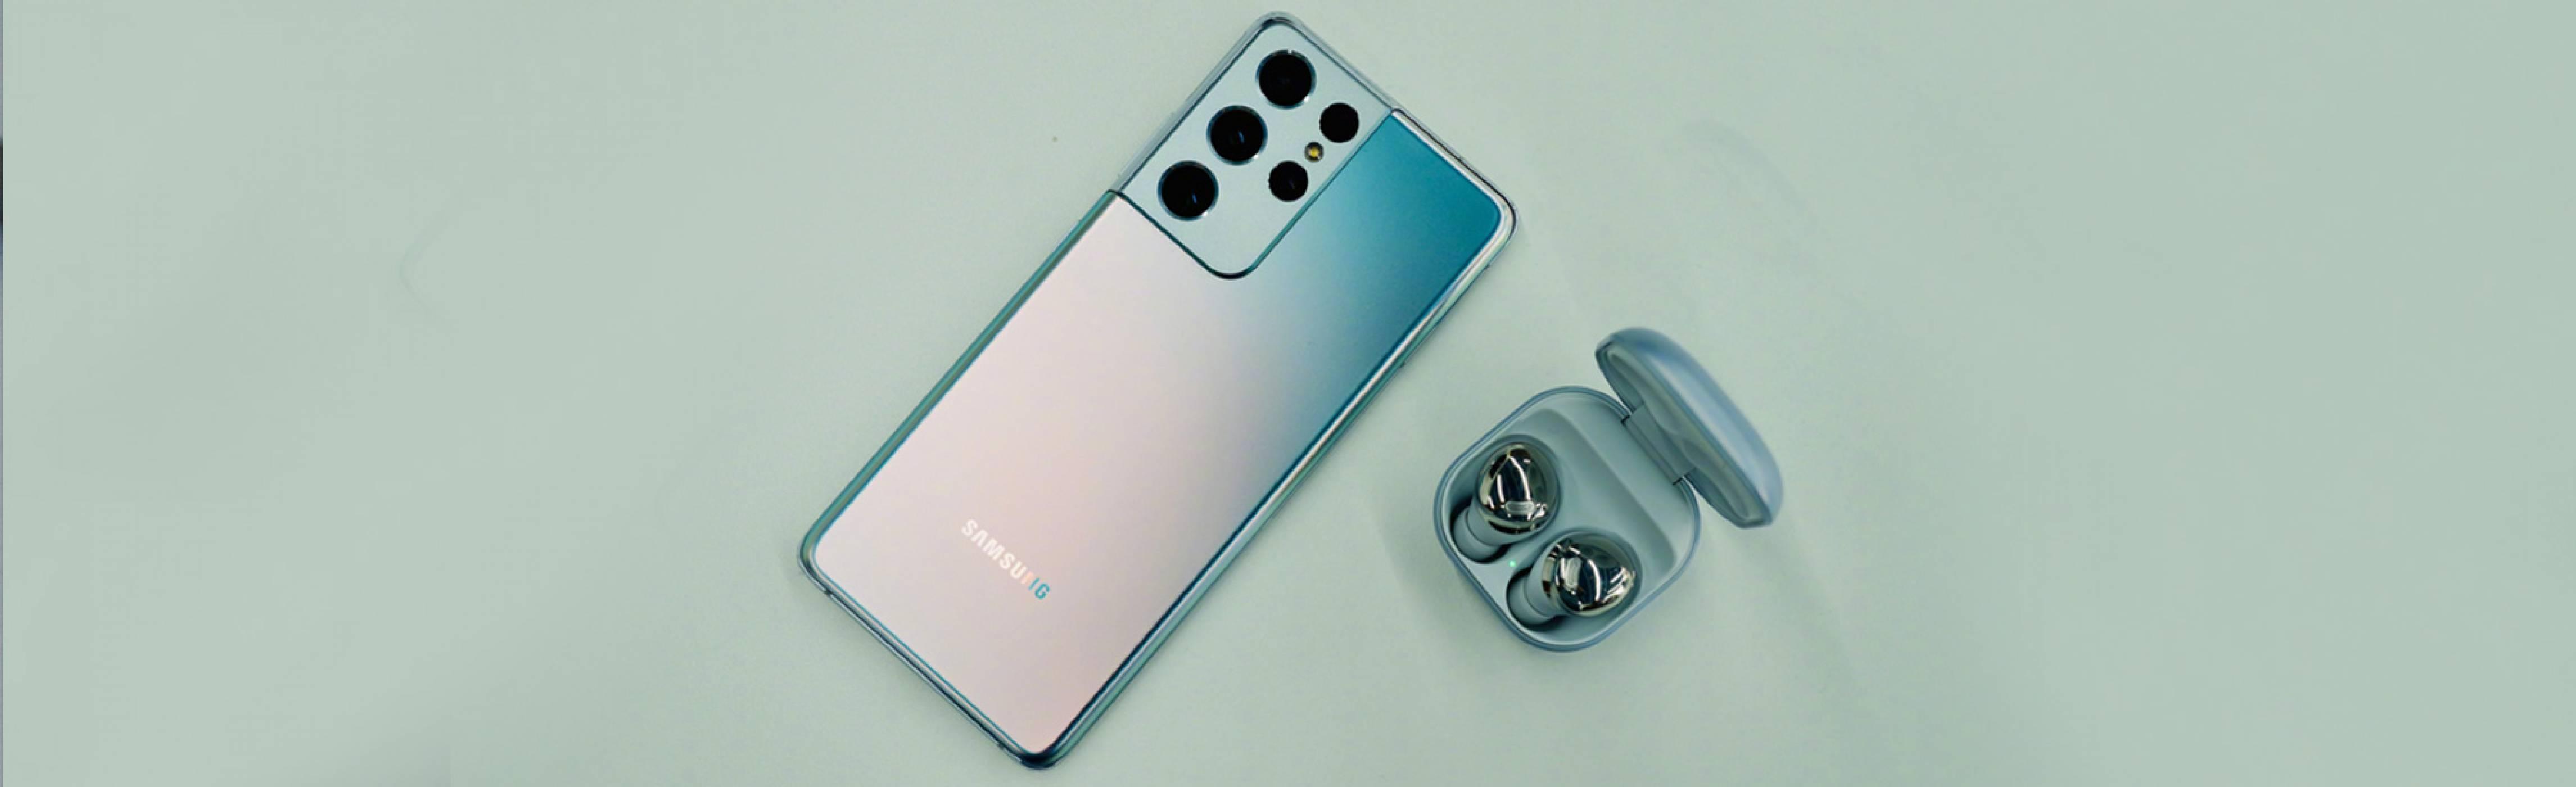 Samsung Galaxy S21 Ultra 5G – галактика от авангардни технологии (HANDS-ON ВИДЕО)